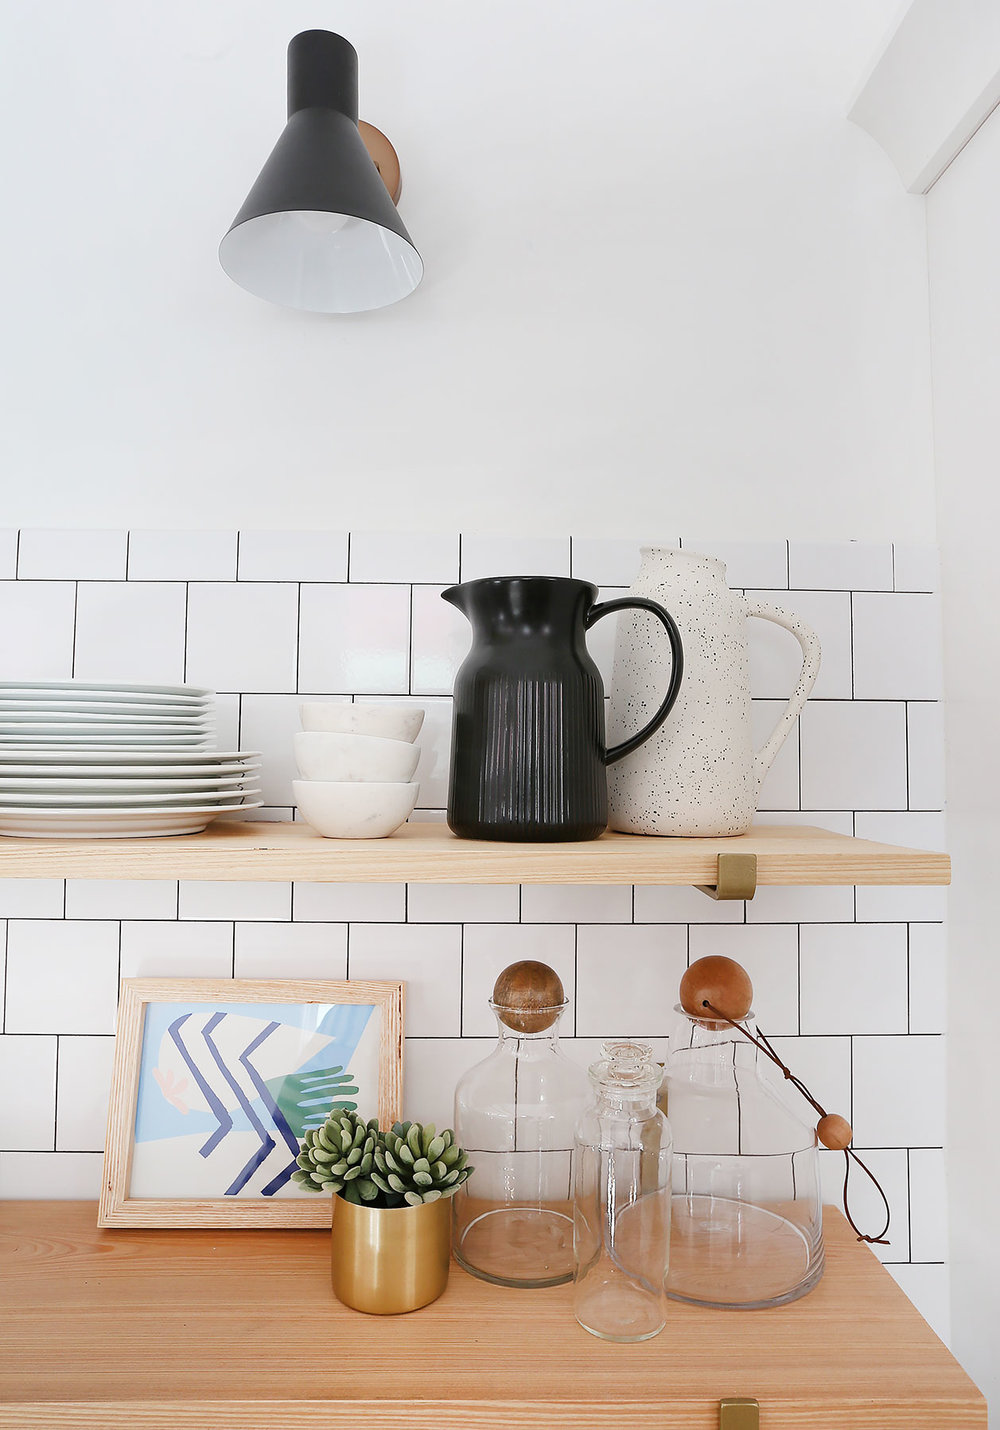 big-side-kitchen-10-low.jpg